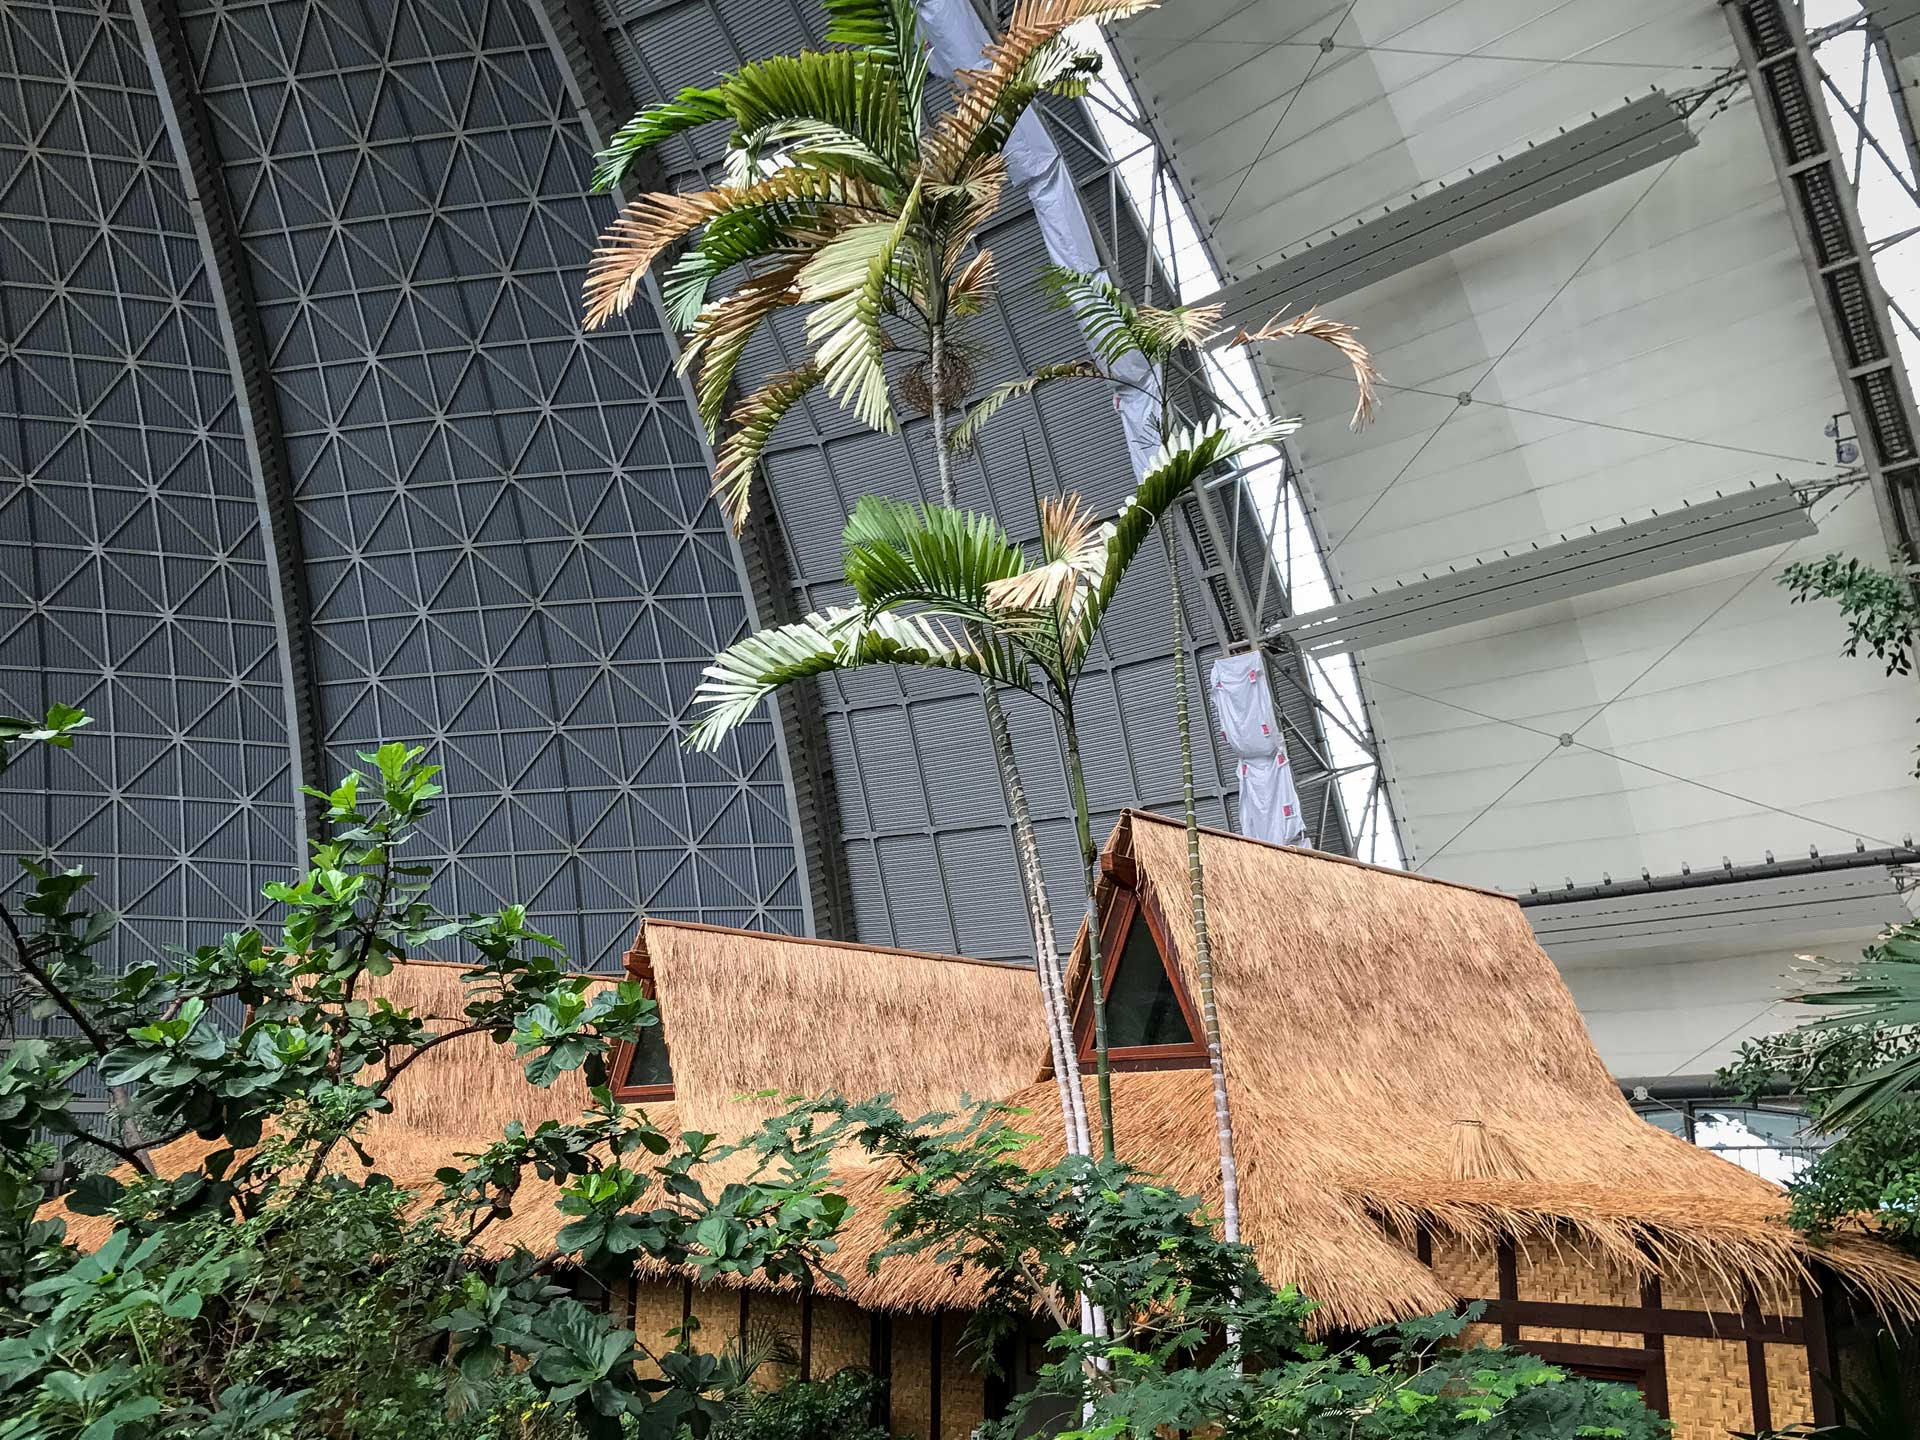 tropical_island_brandenburg_reetdachdecker02